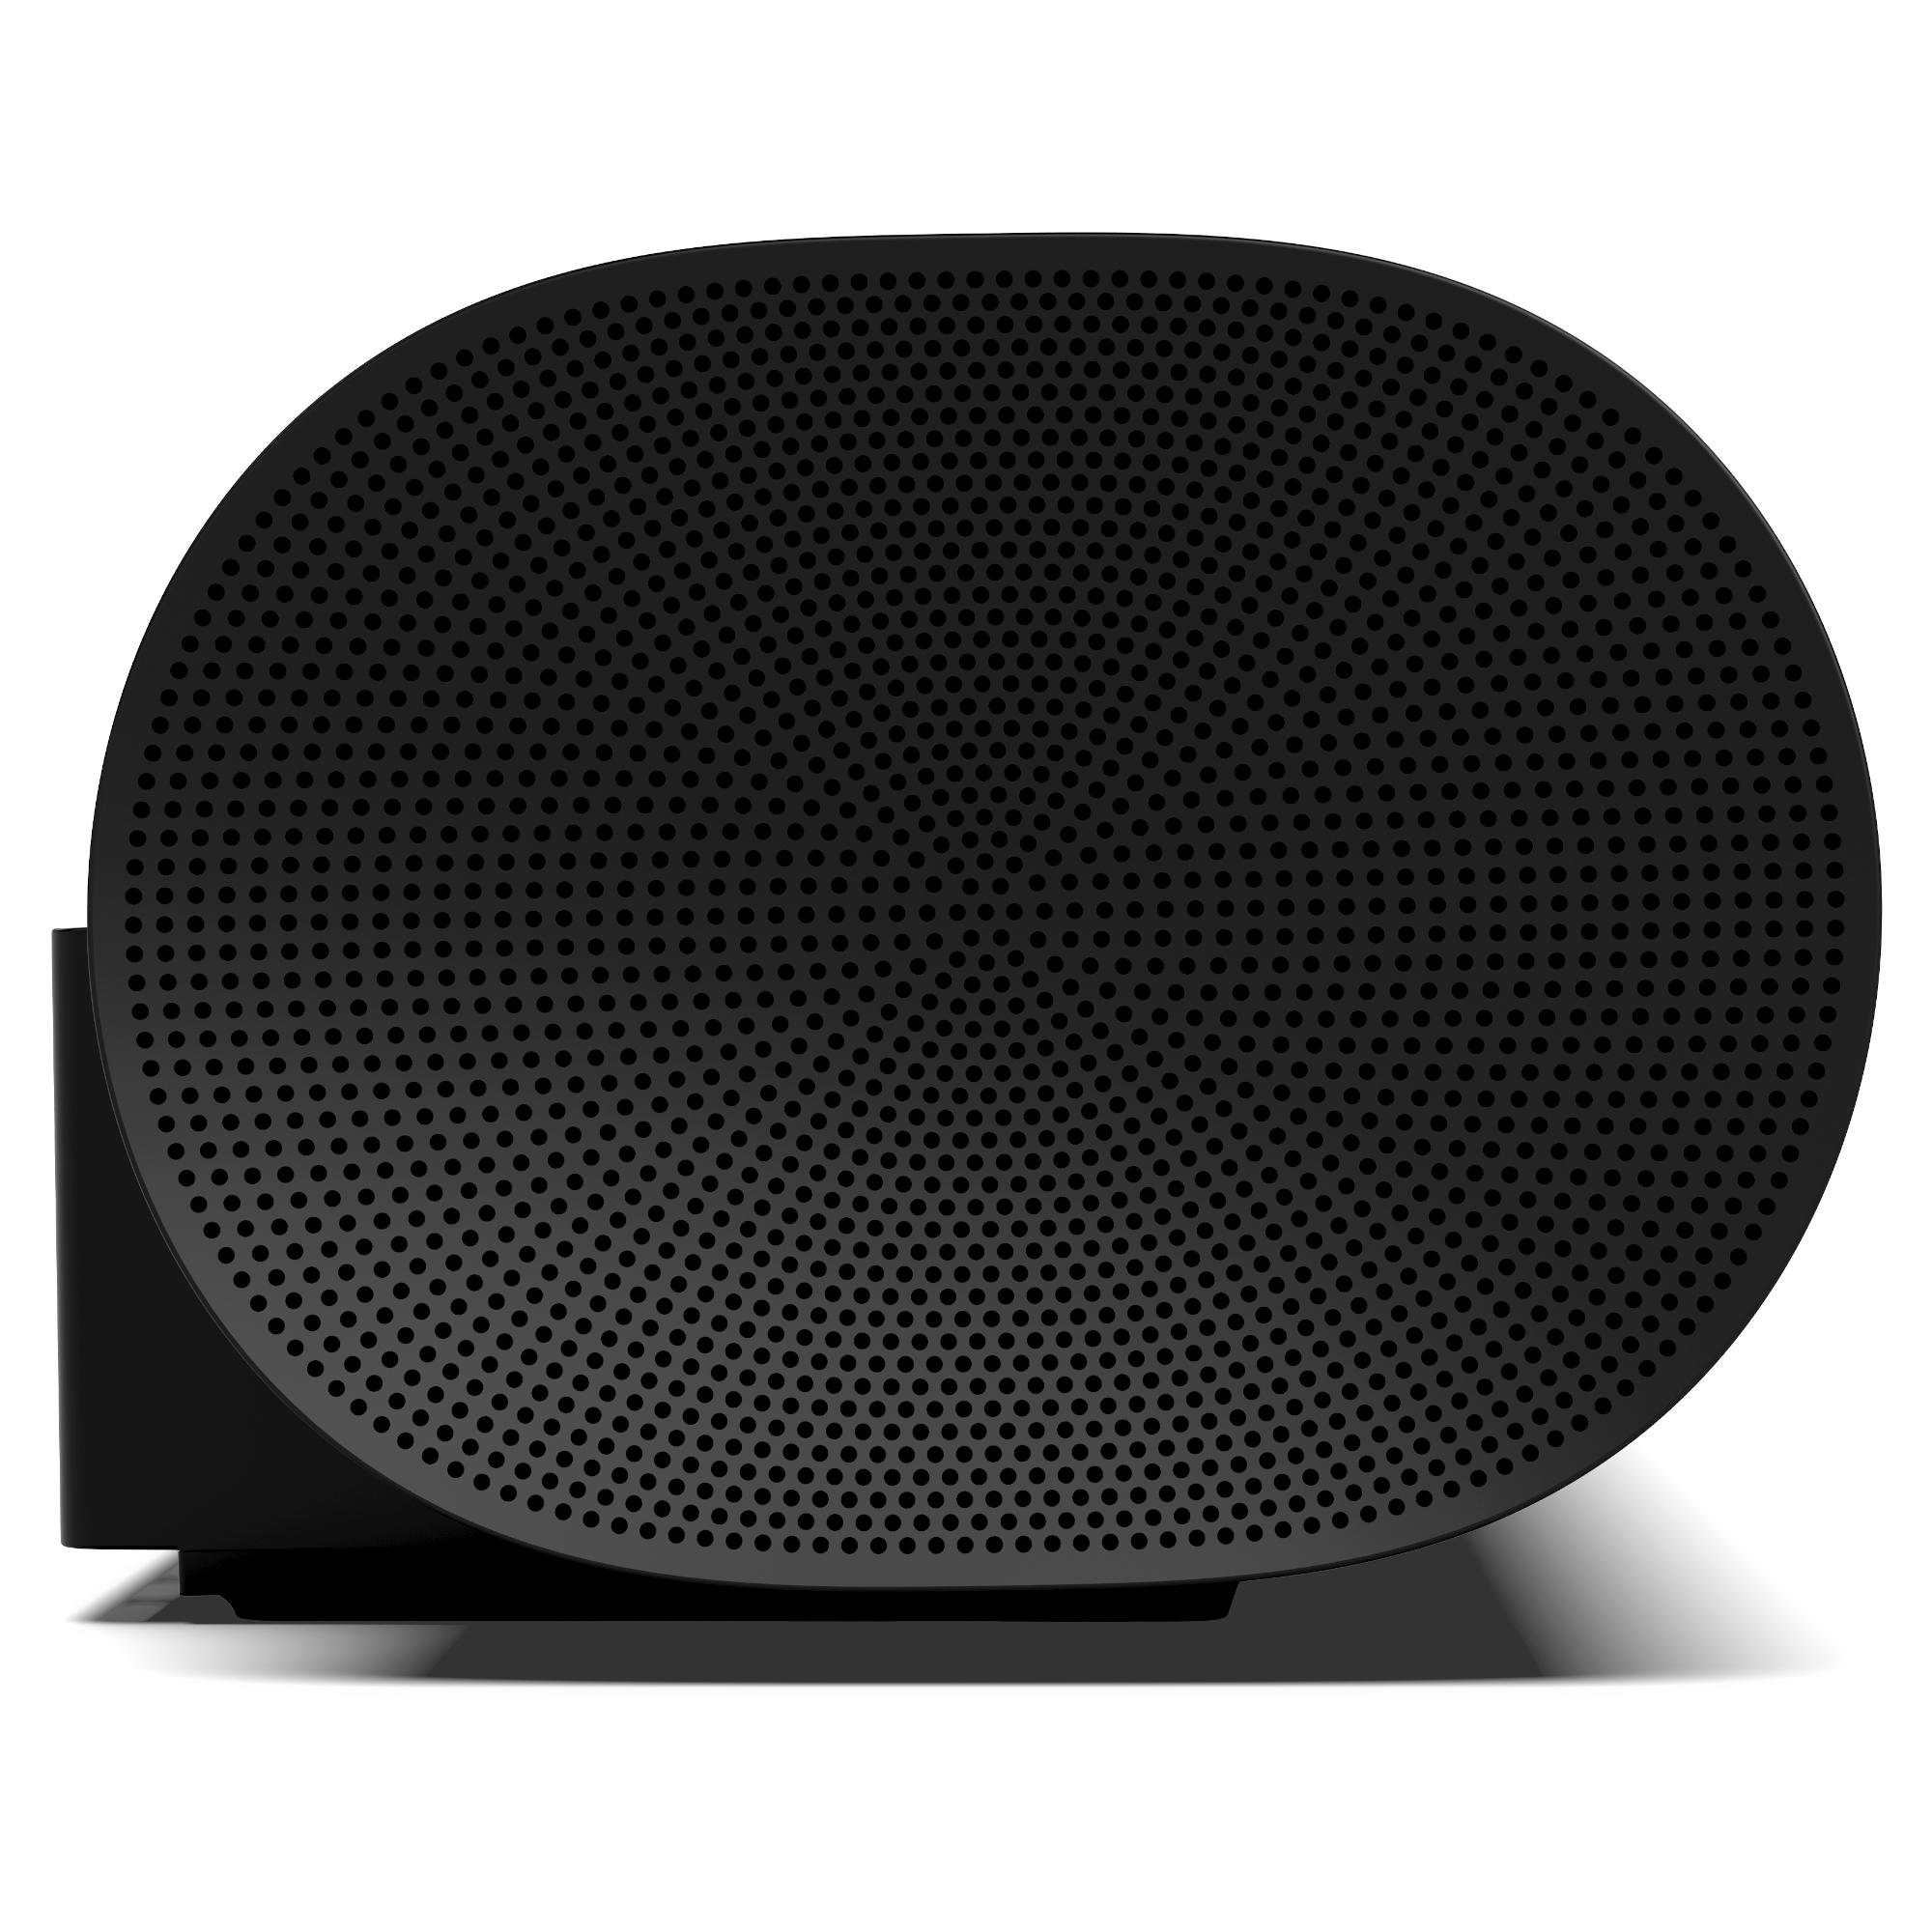 Sonos Arc 3.0 Sound Bar with Dolby Atmos, Amazon Alexa & Google Assistant